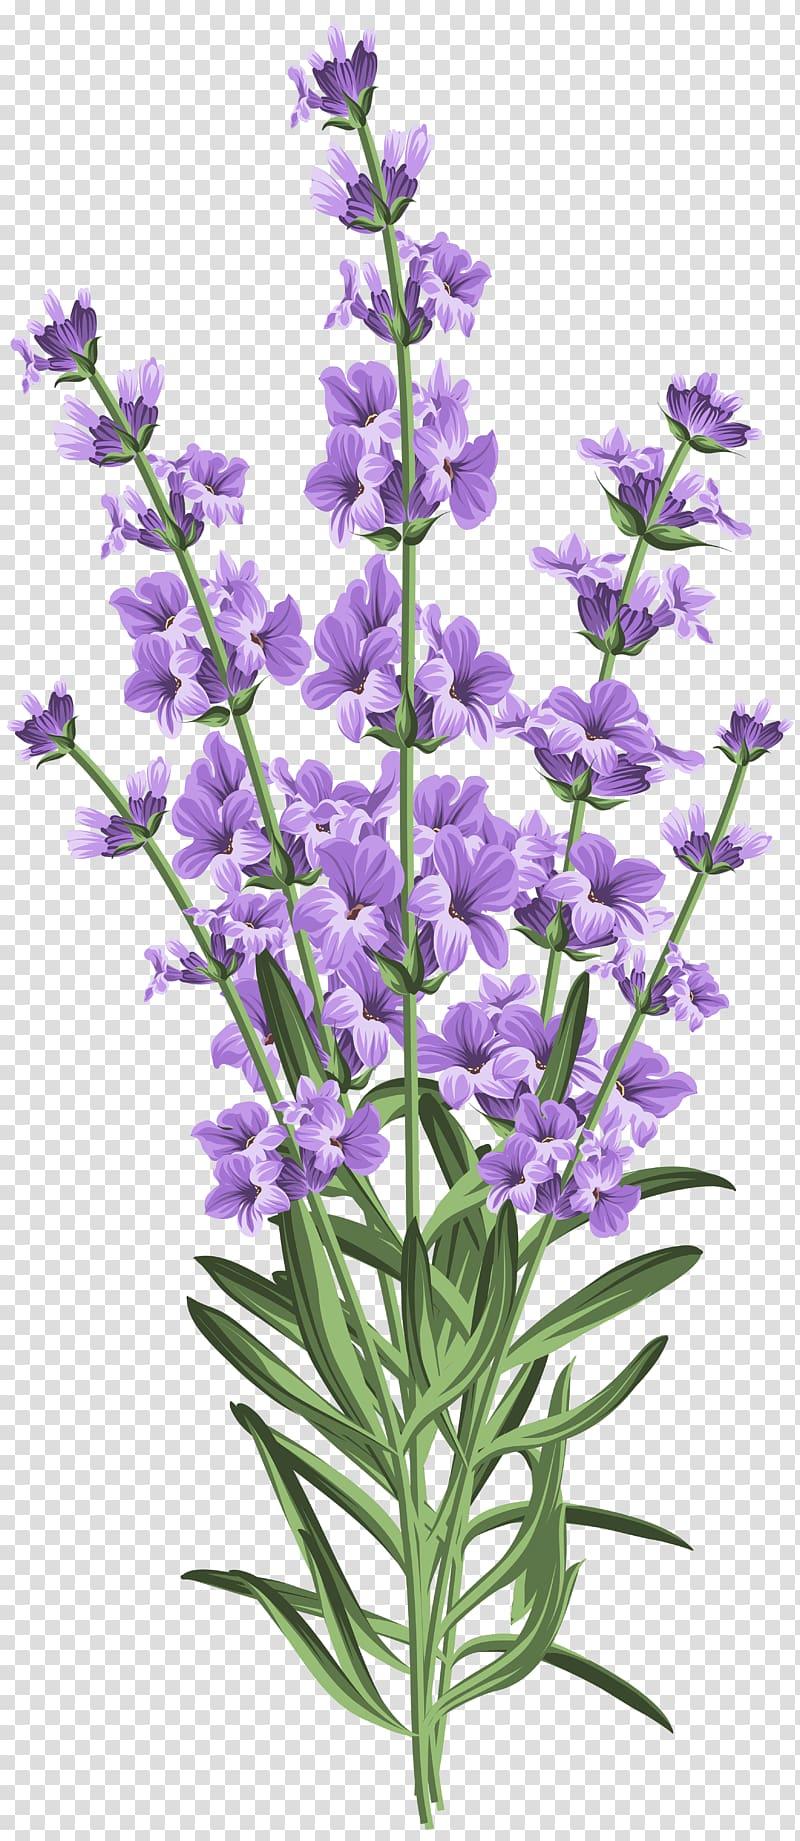 Wedding invitation flower transparent. Lavender clipart lavender plant